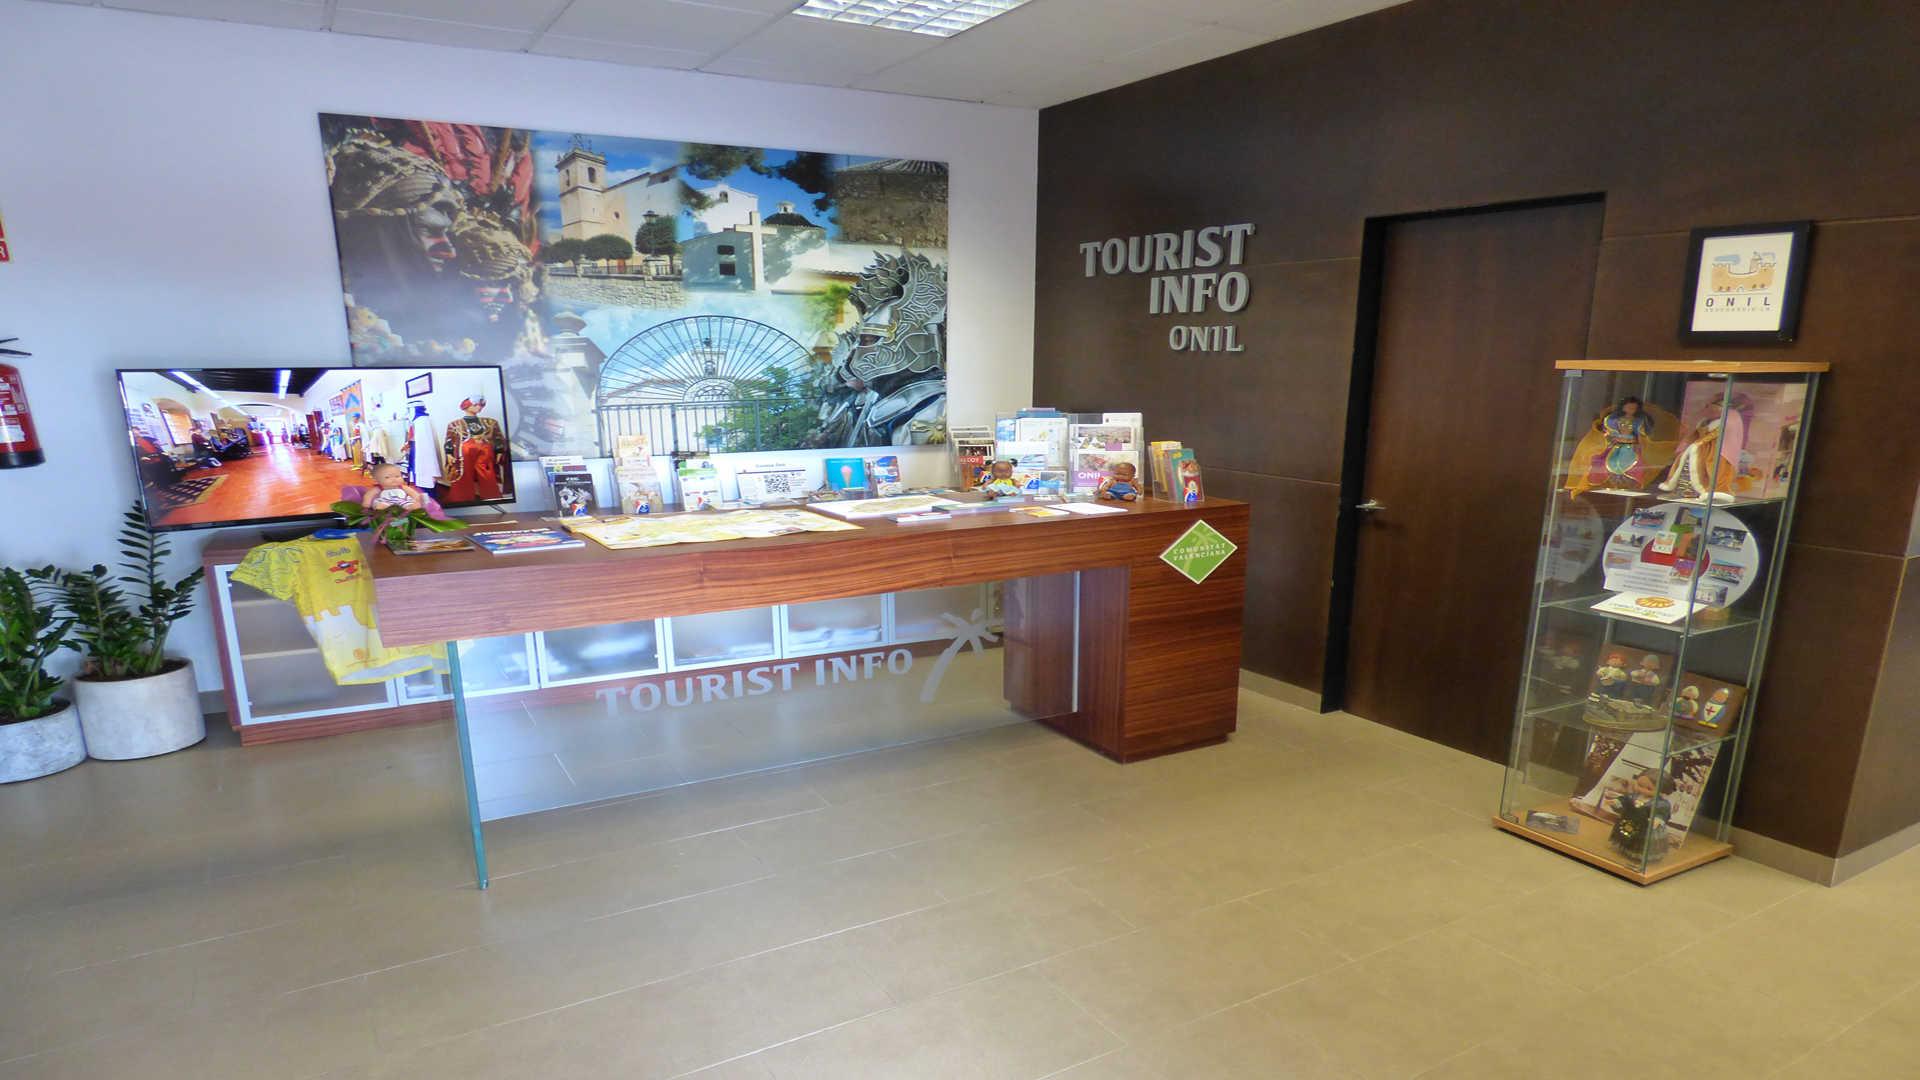 TOURIST INFO ONIL